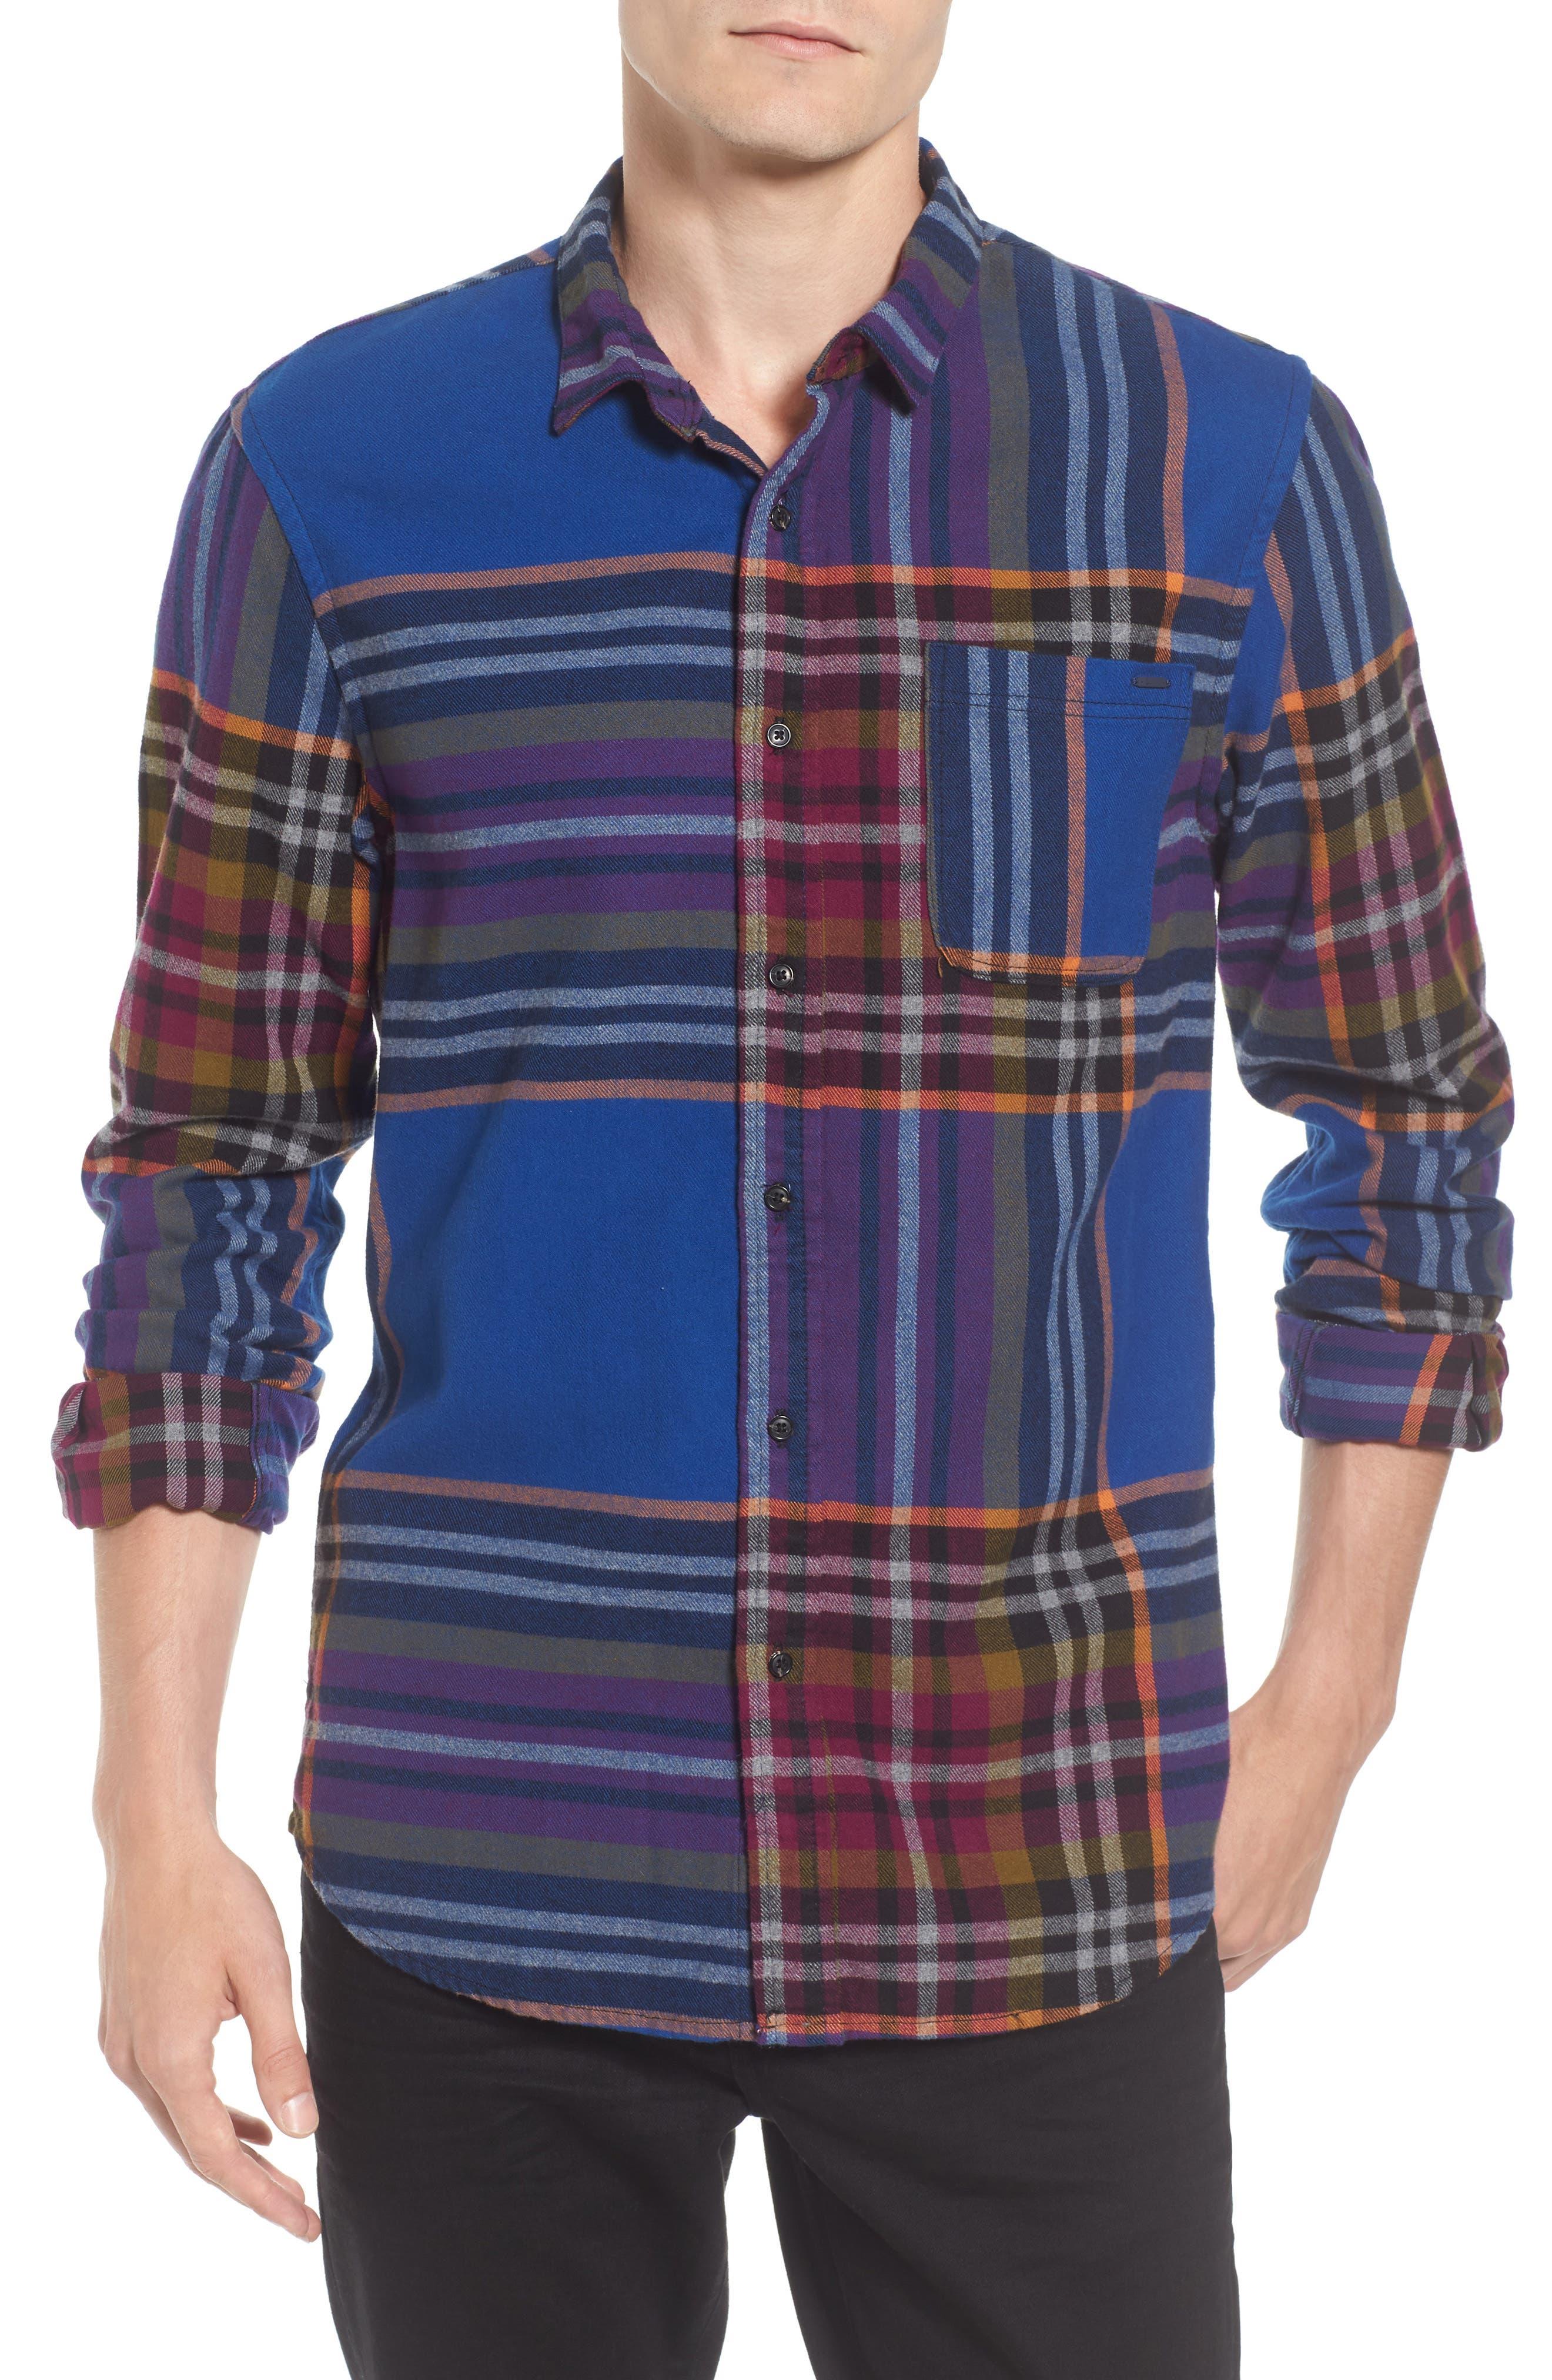 Brushed Flannel Plaid Shirt,                             Main thumbnail 1, color,                             Blue